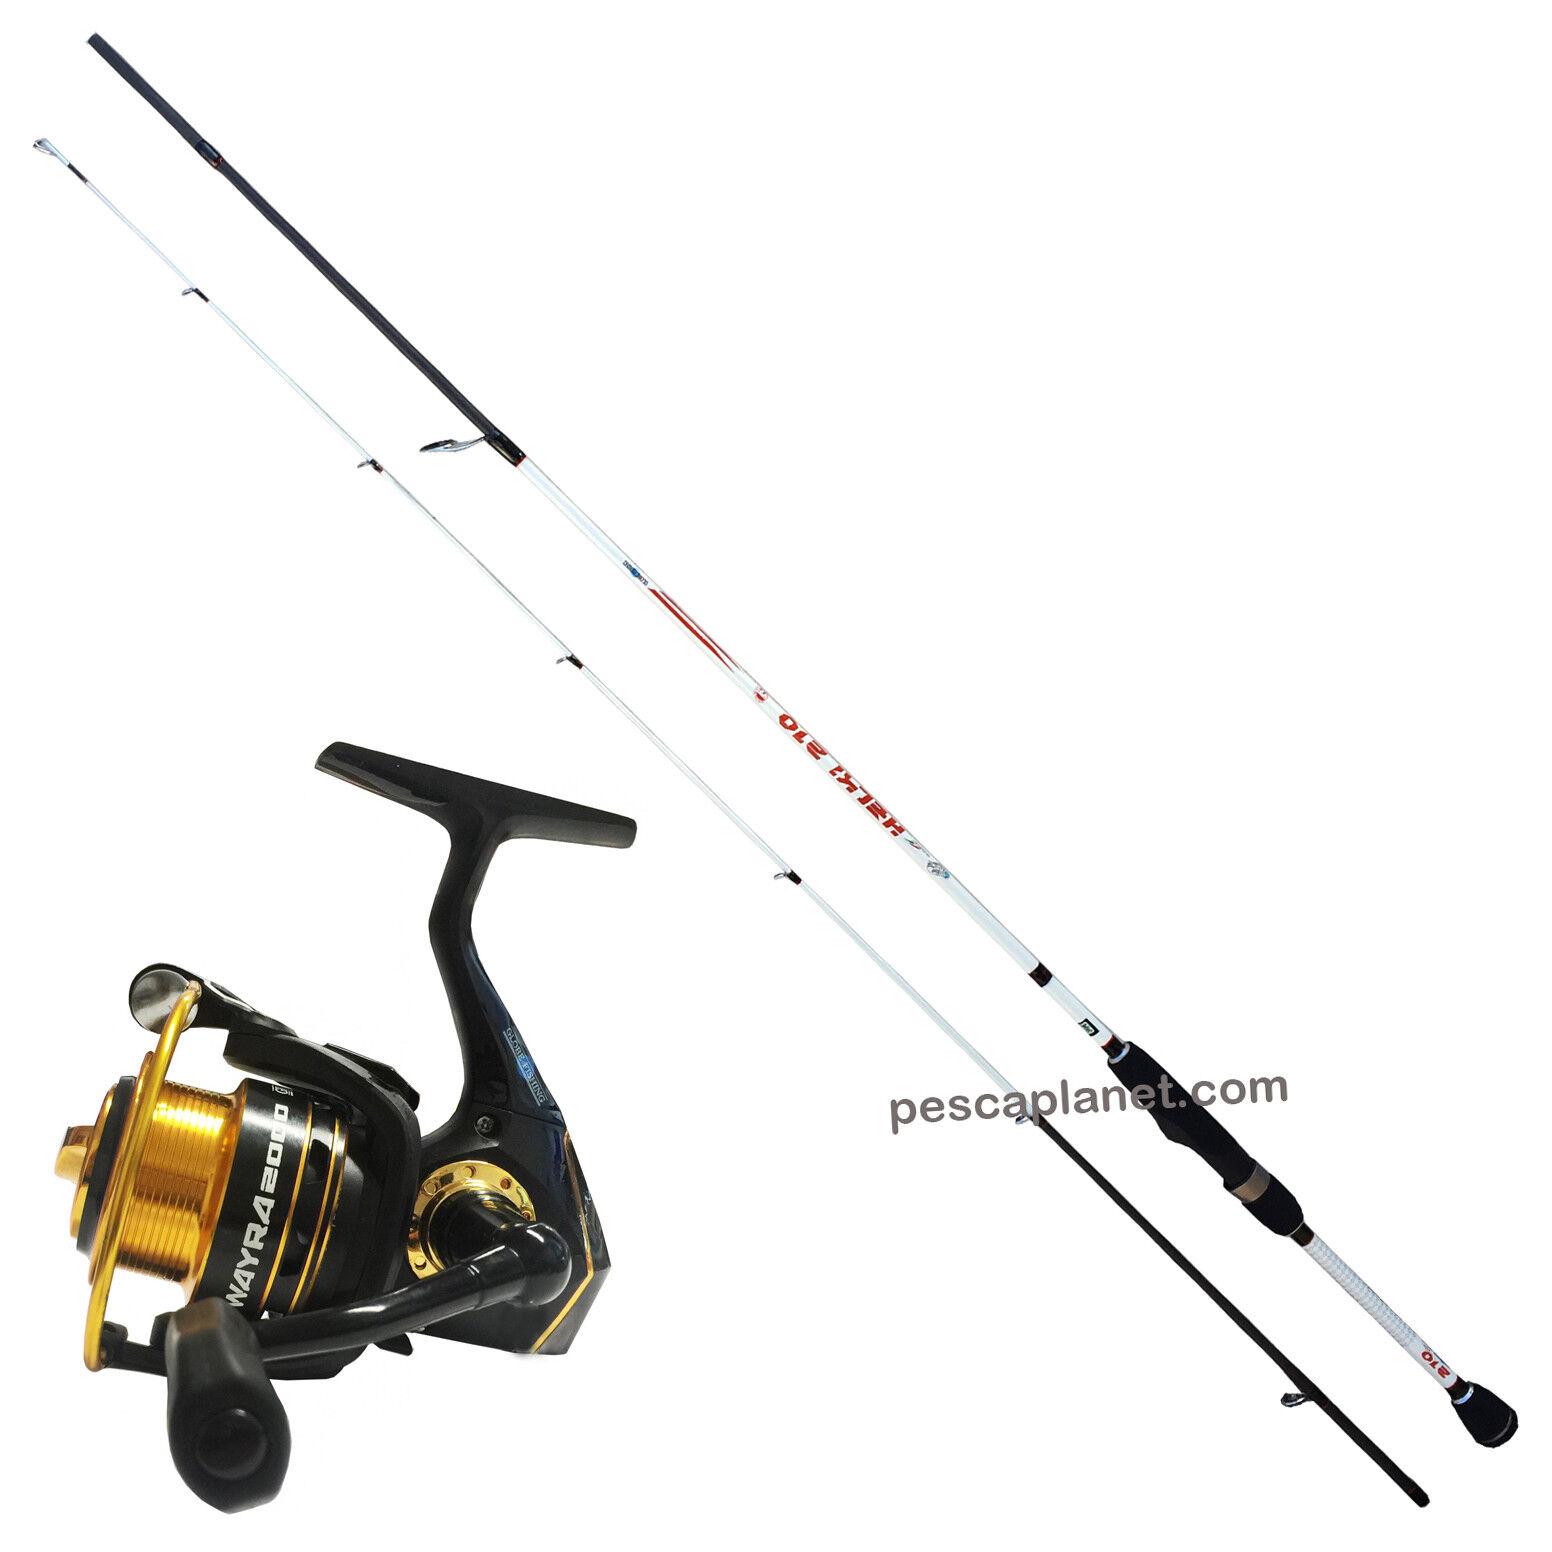 KP3551 Kit Pesca Trout Area Globe Fishing Canna Helki 2,10 m + Mulinello Wa RNG